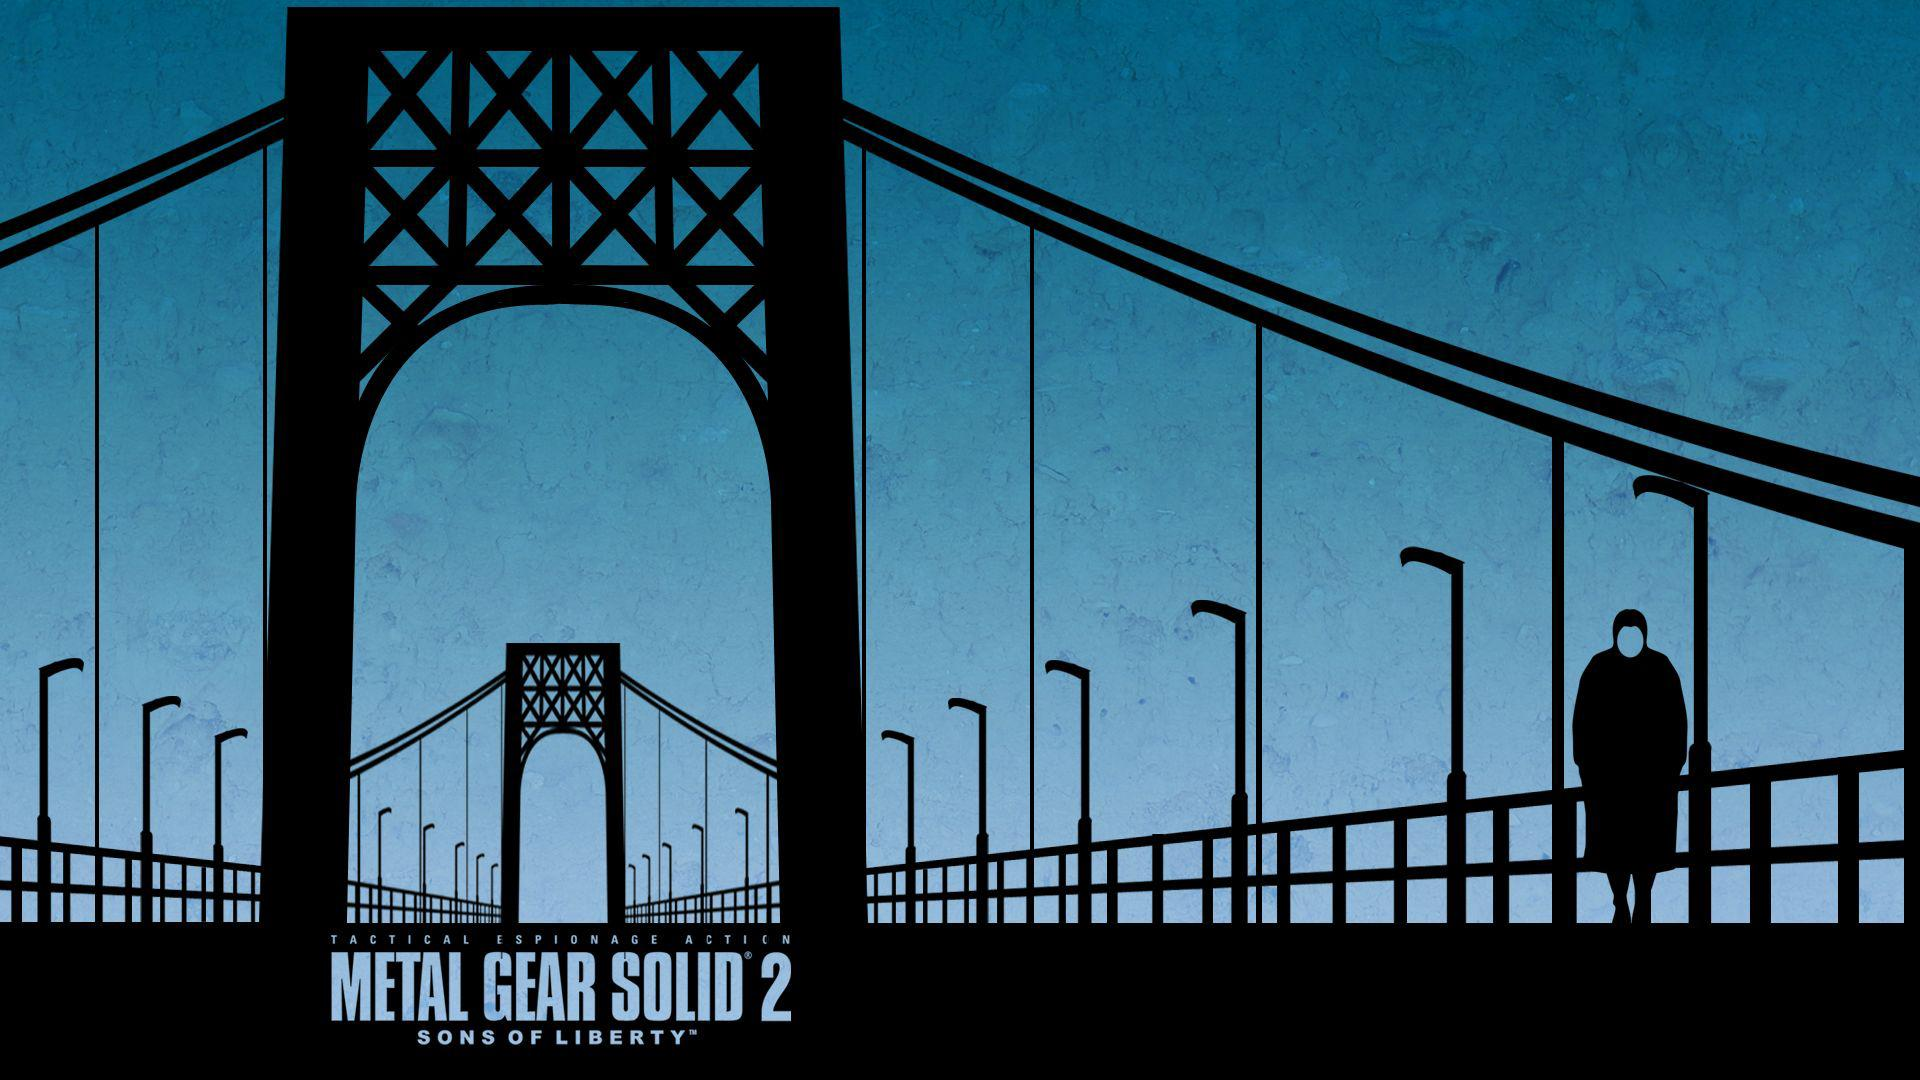 Metal Gear Solid 2 Wallpapers - Wallpaper Cave